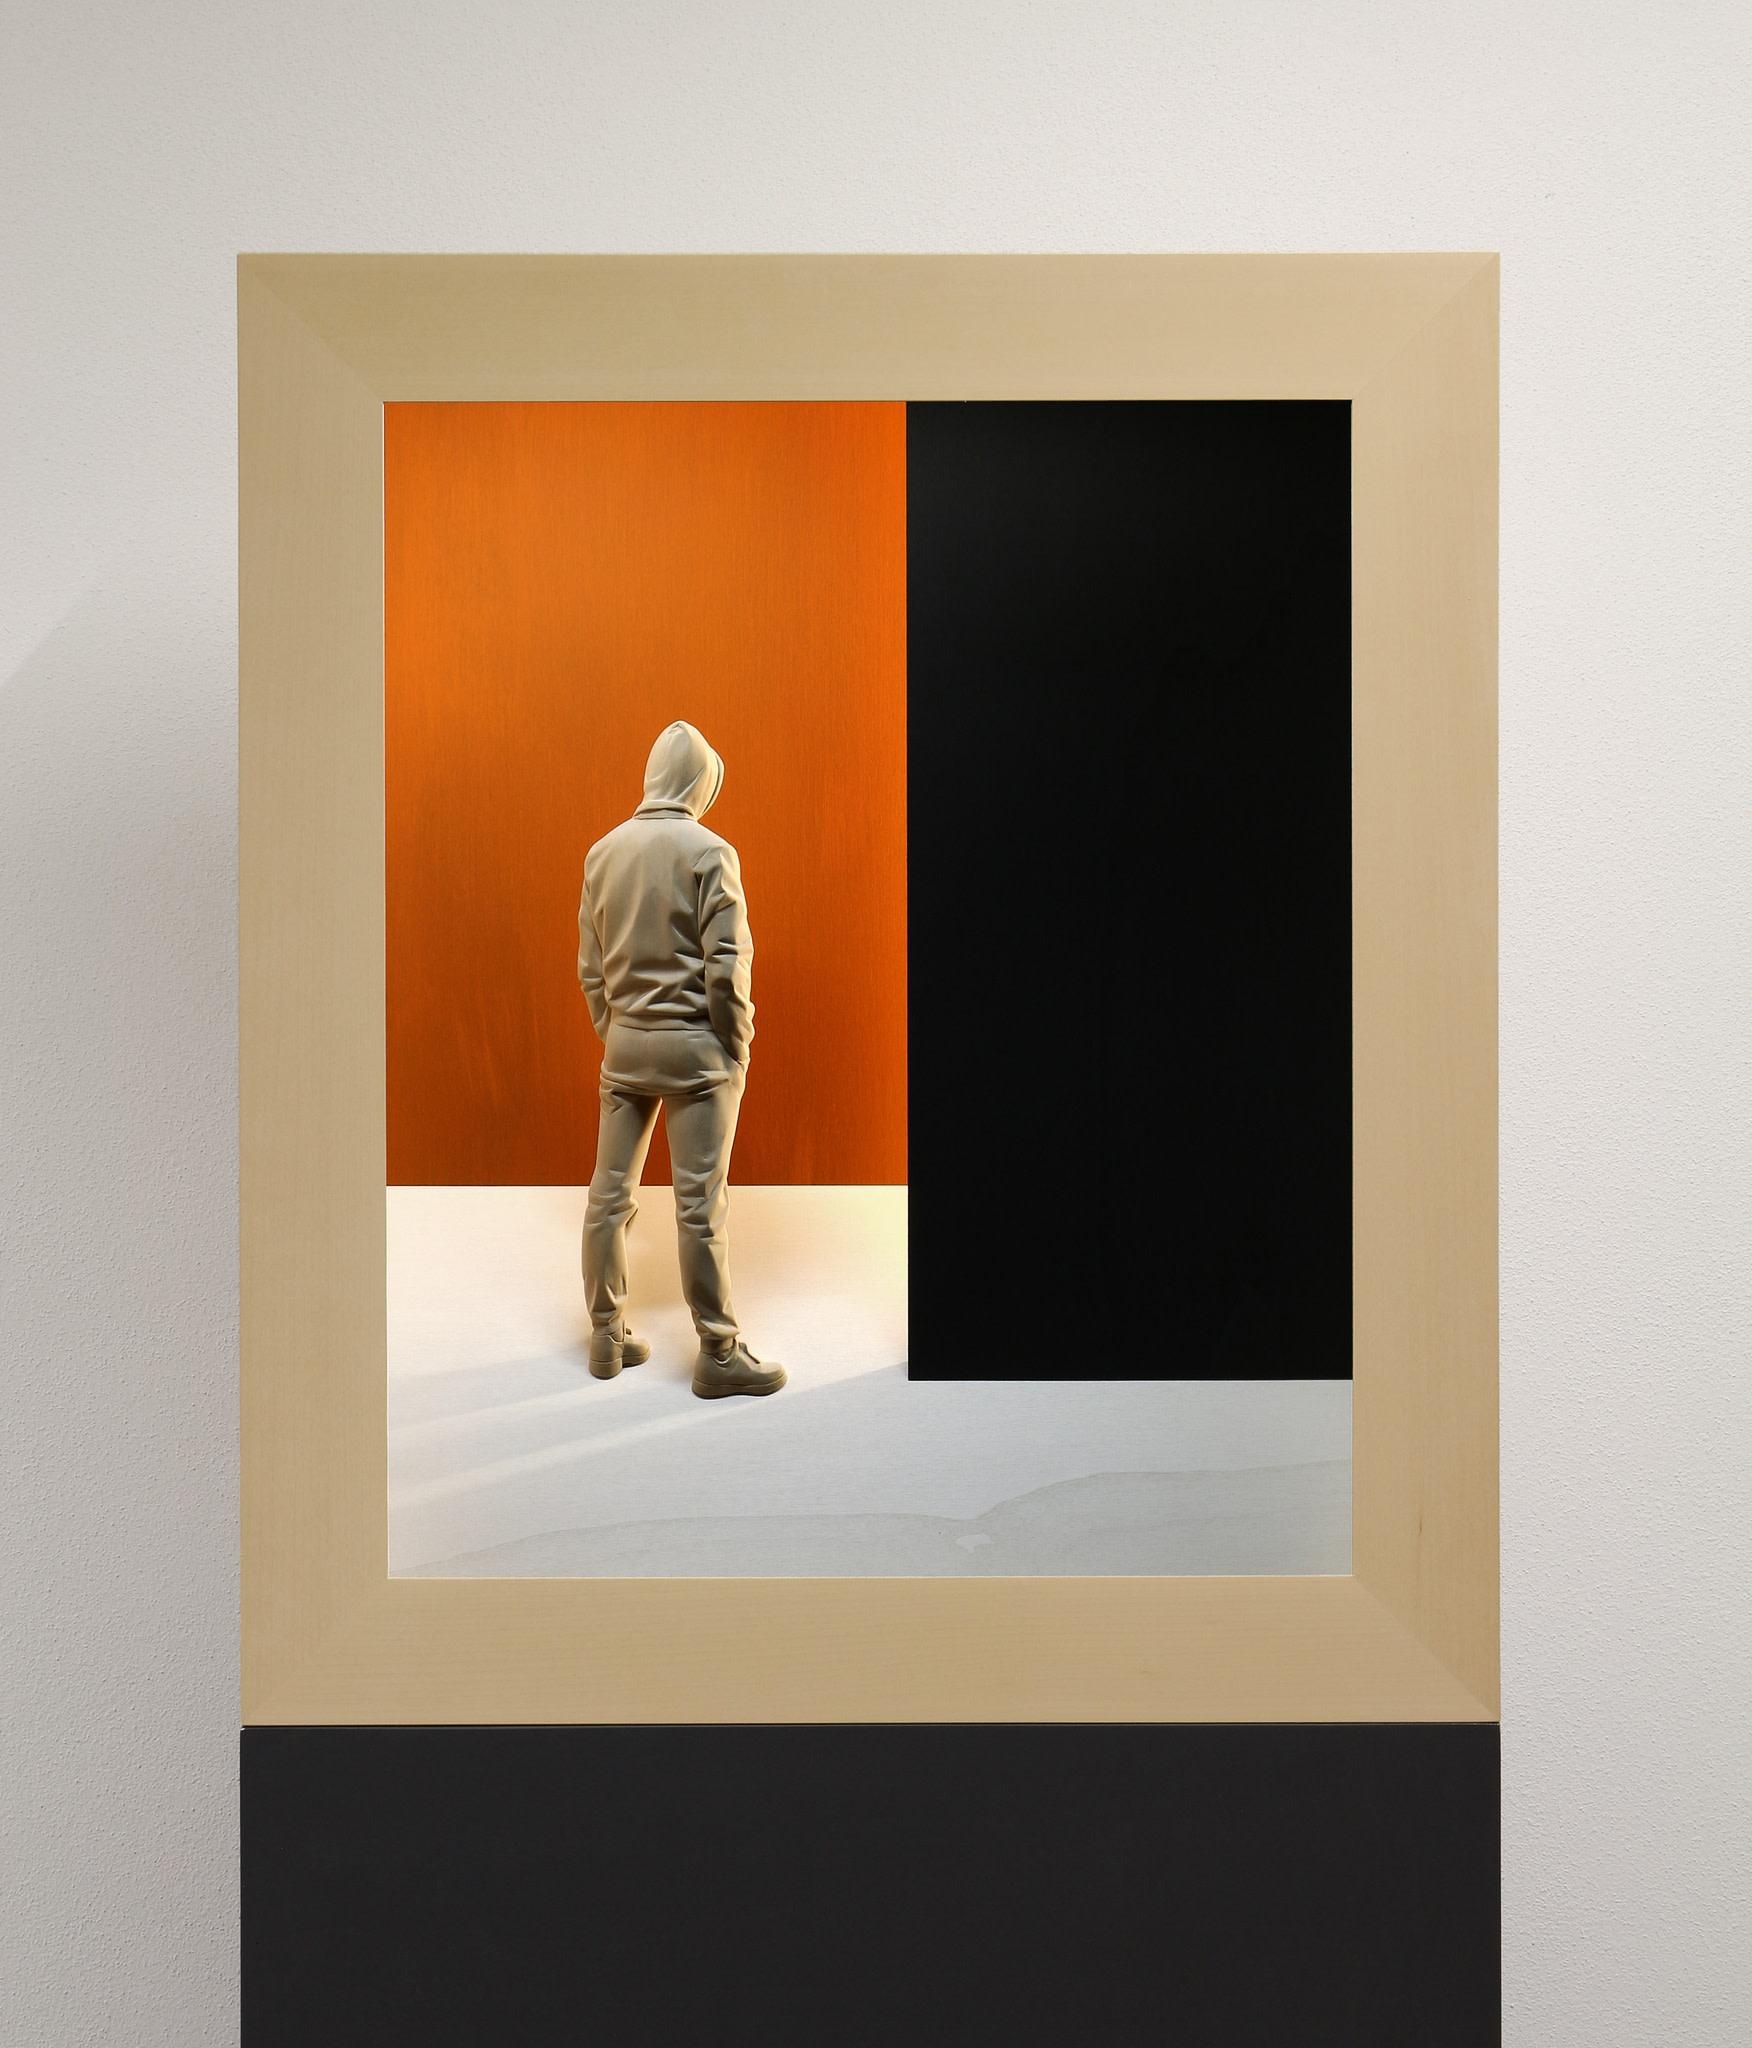 <span class=&#34;link fancybox-details-link&#34;><a href=&#34;/exhibitions/113/works/artworks2429/&#34;>View Detail Page</a></span><div class=&#34;artist&#34;><strong>Peter Demetz</strong></div><div class=&#34;title&#34;><em>The Right Way</em>, 2017</div><div class=&#34;medium&#34;>Linden wood, acrylics, LED</div><div class=&#34;dimensions&#34;>70 x 60 x 19.5 cm</div>